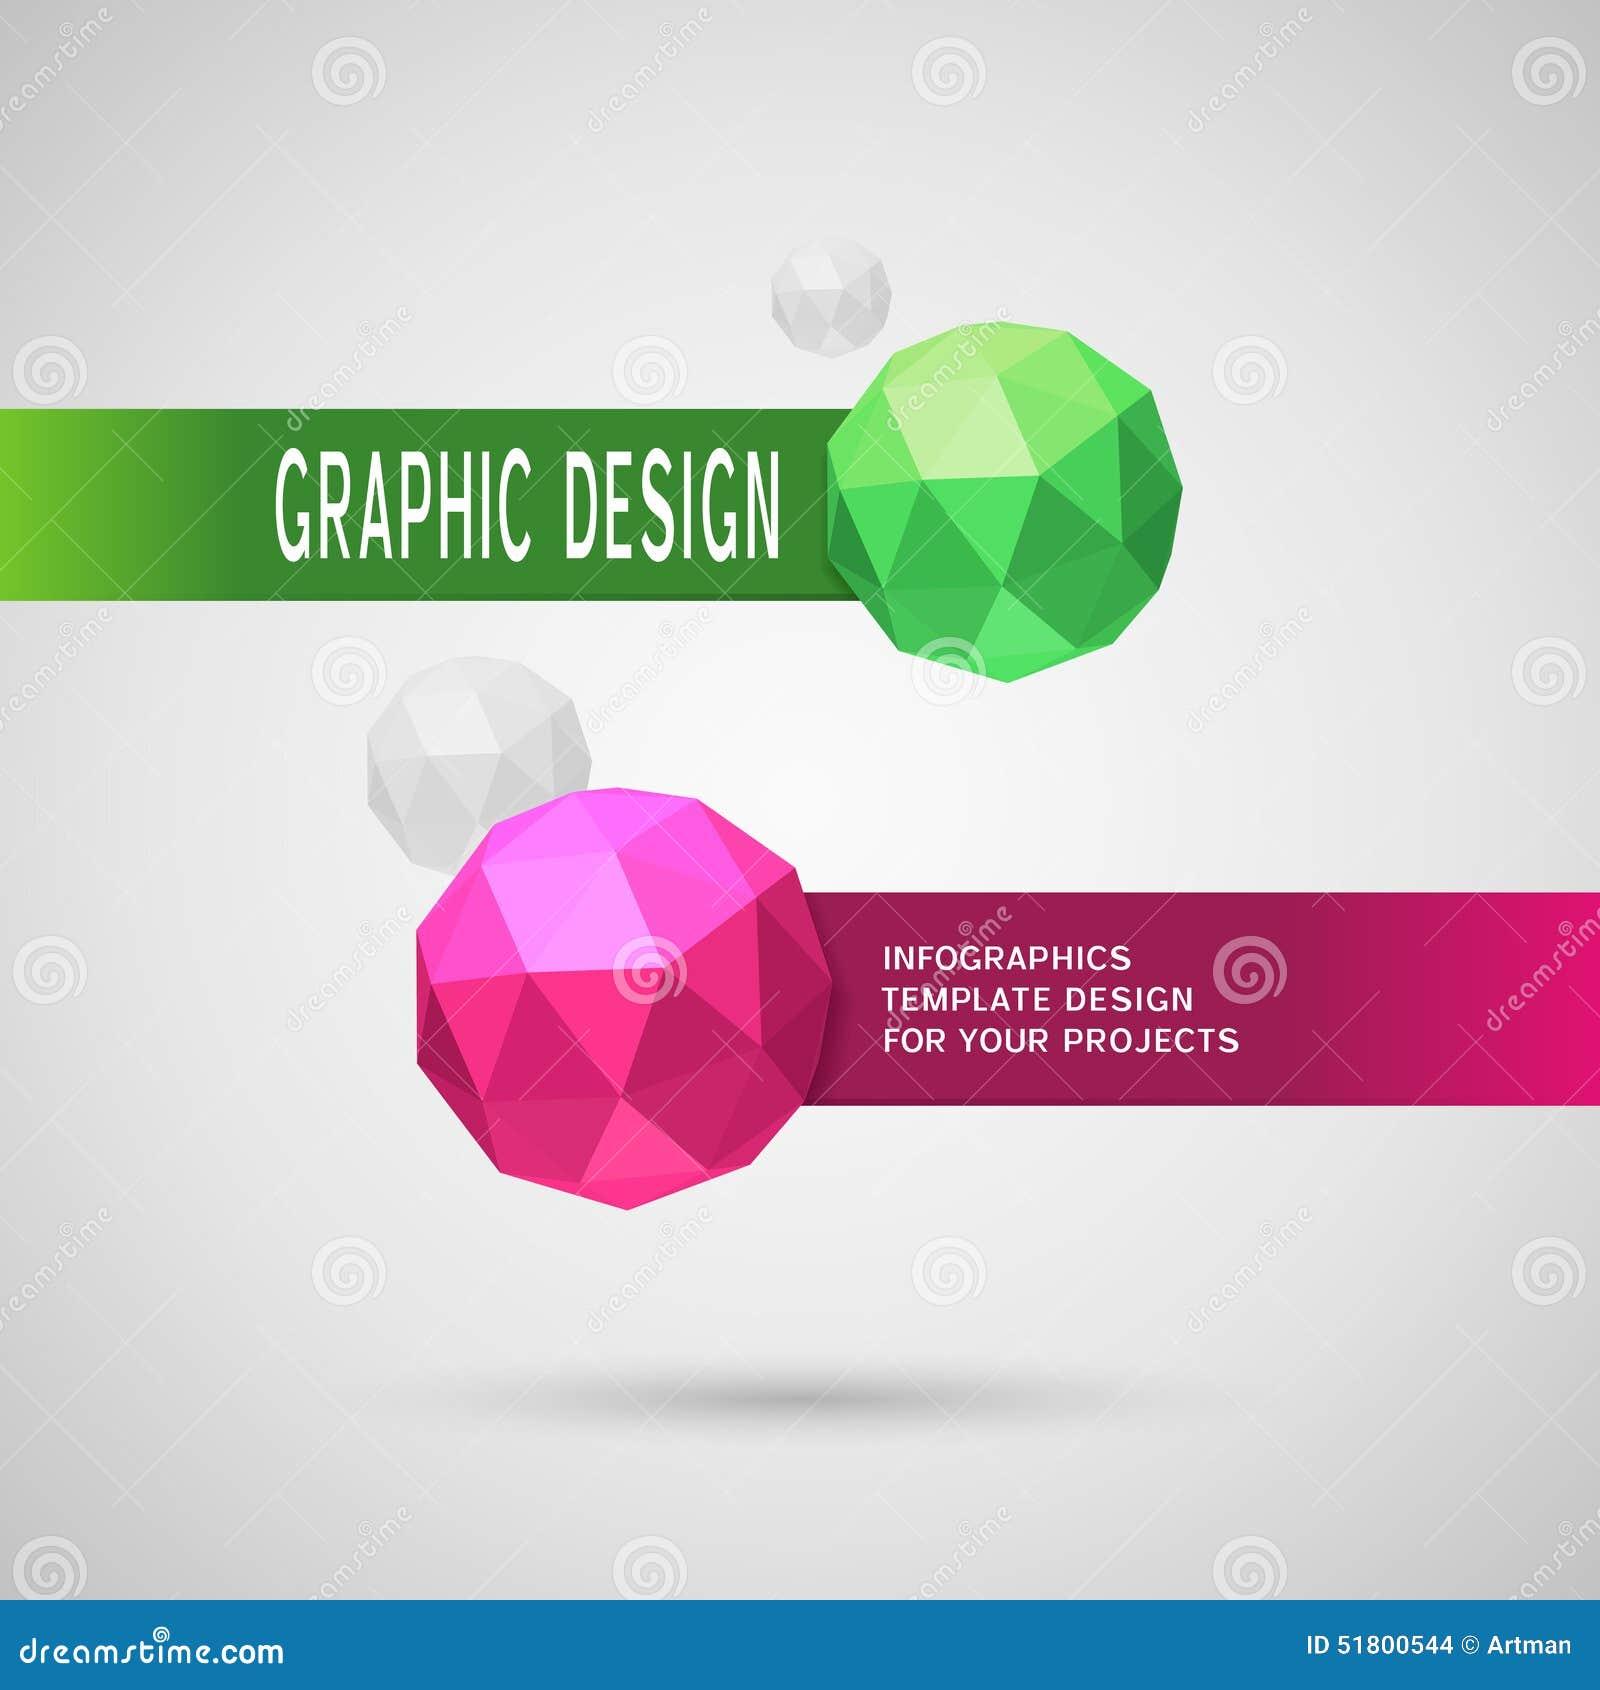 Abstraktes infographic Design mit zwei kugelförmigen Elementen